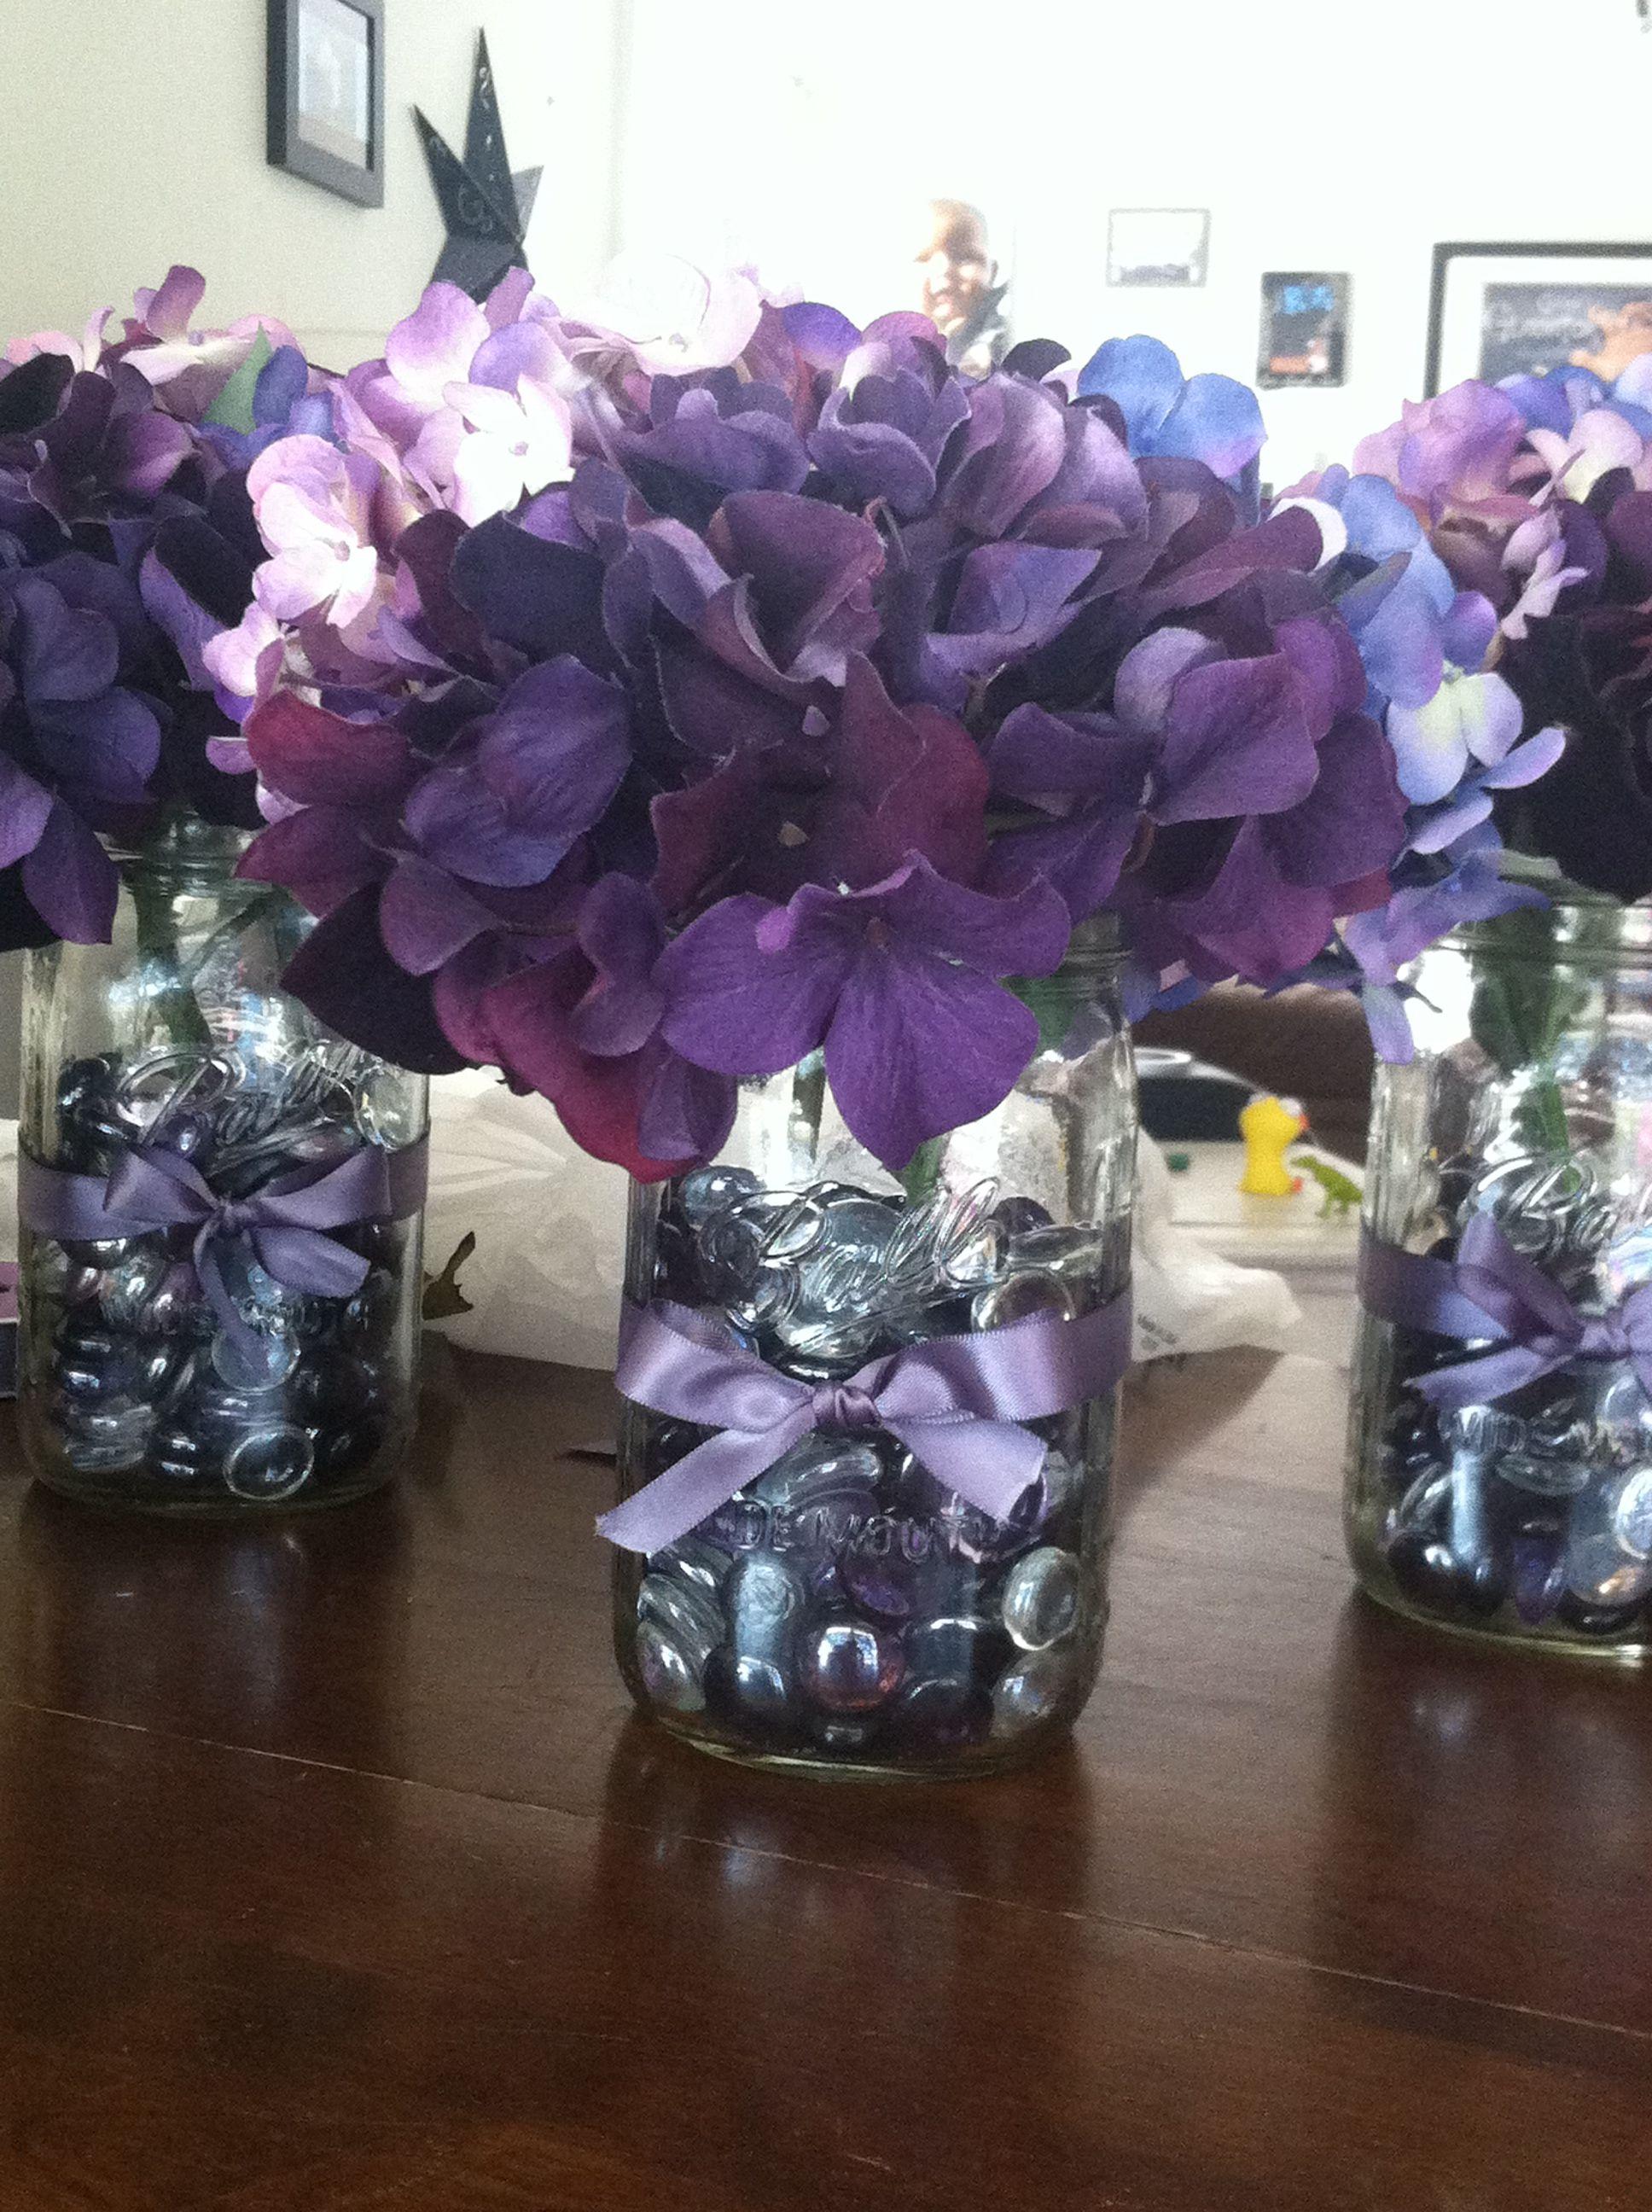 Diy purple wedding decormasonjarhydrangearibbonmichaels i do diy purple wedding decormasonjarhydrangearibbonmichaels junglespirit Choice Image